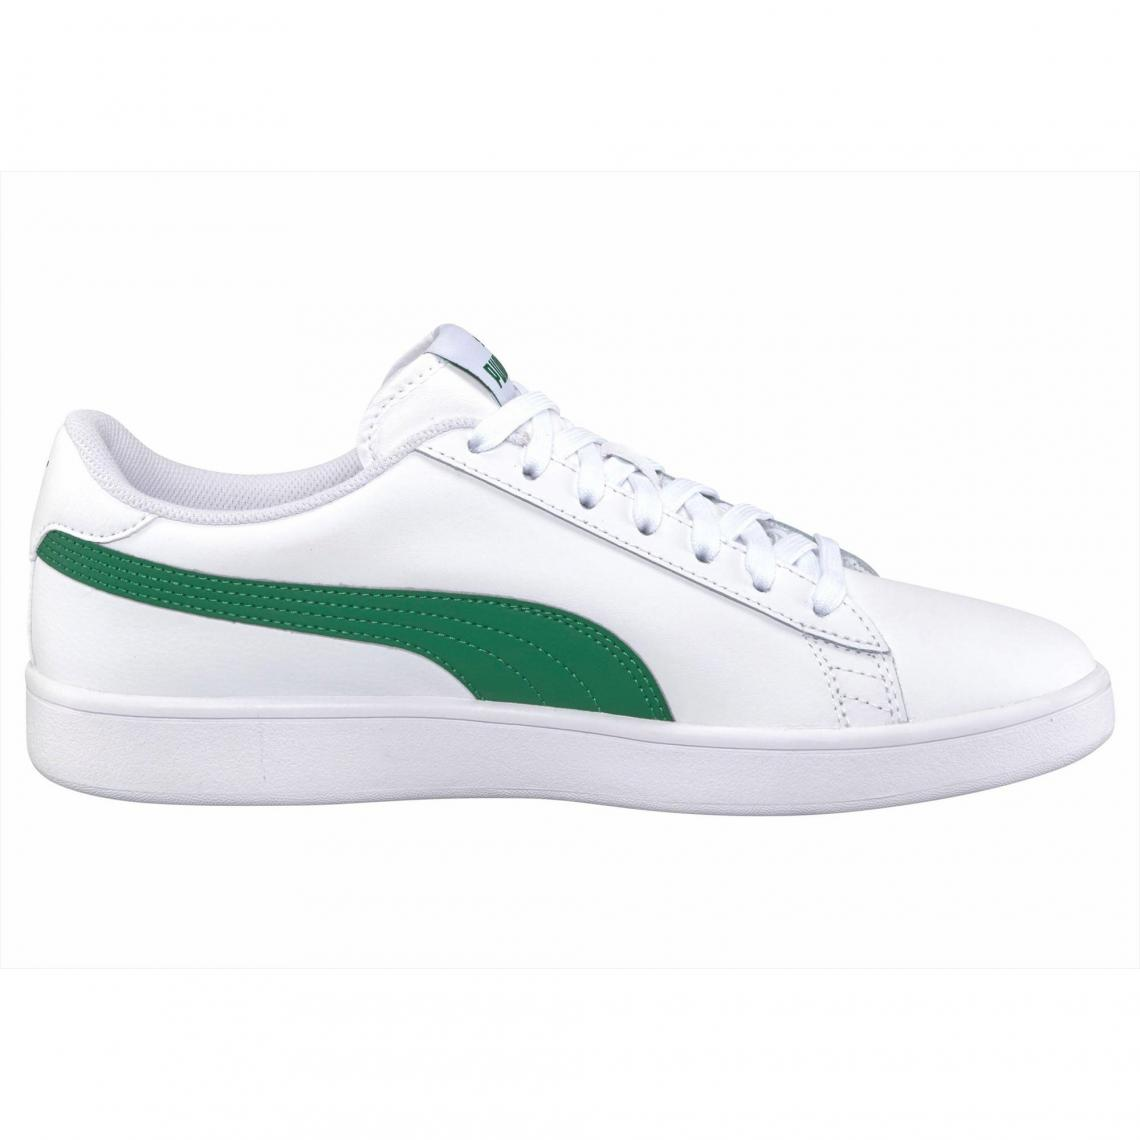 406dde34ac5 Sneakers homme Smash v2 L U Puma - Blanc - Vert